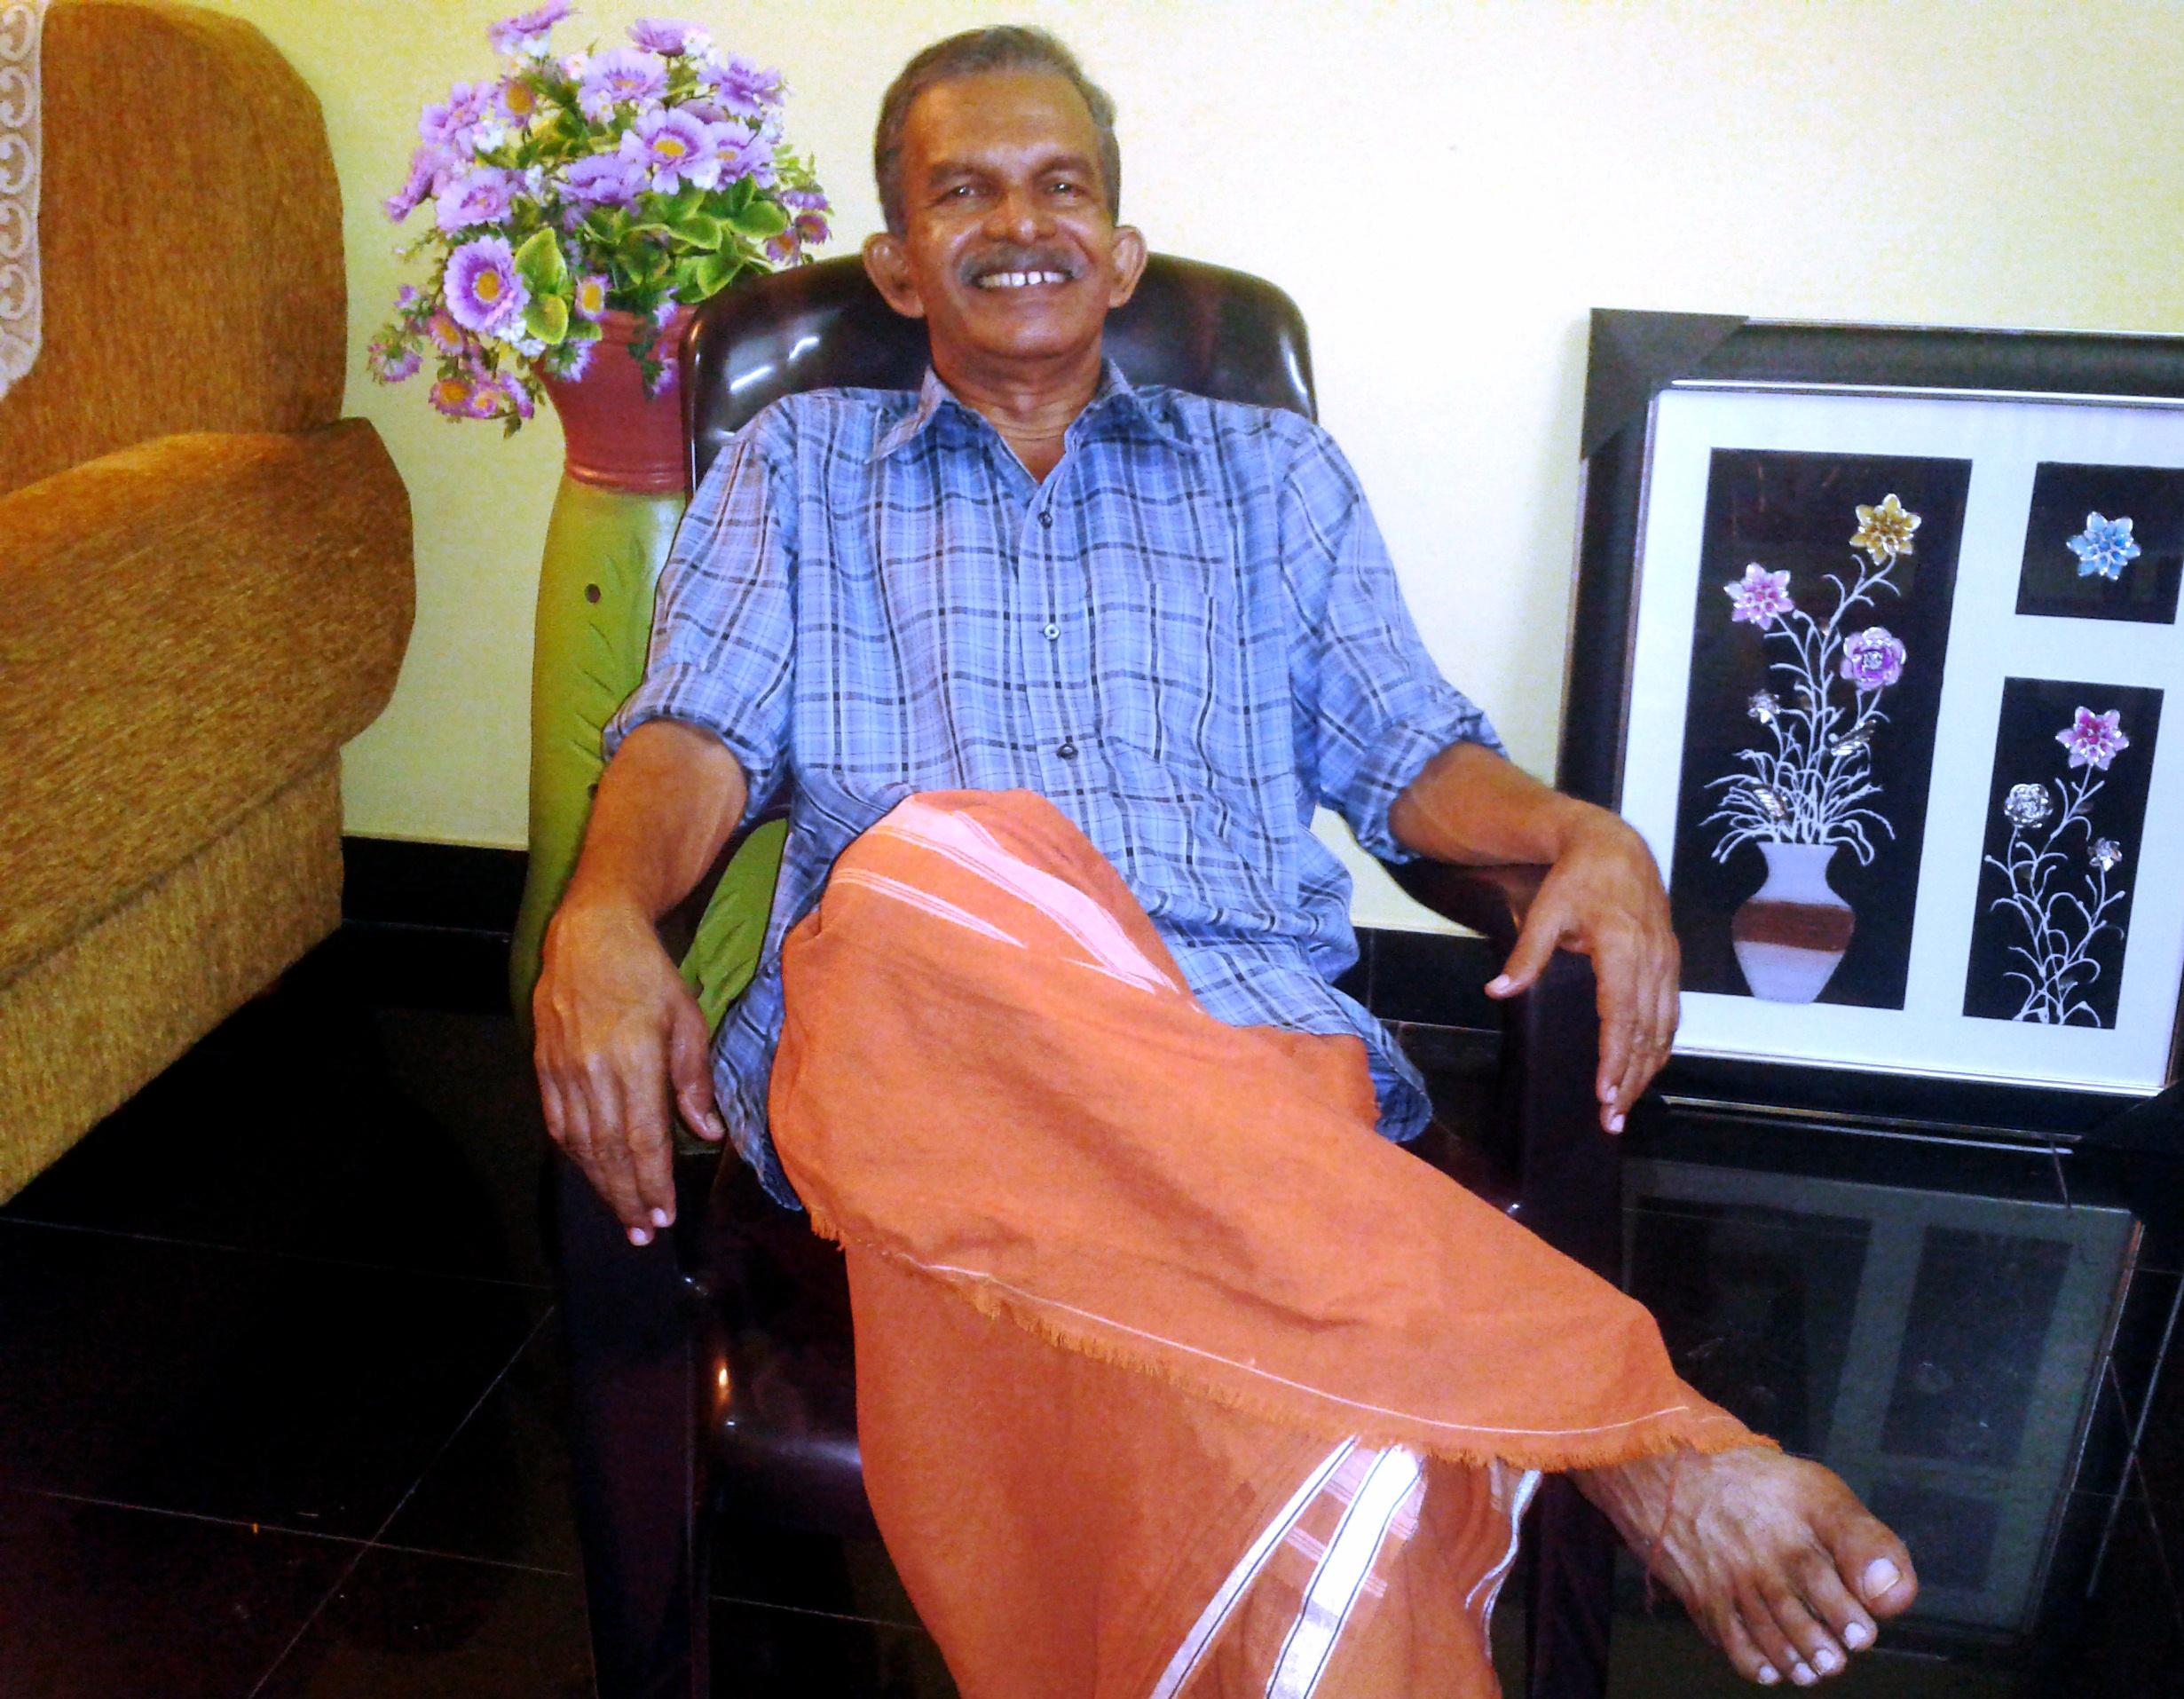 shanmukhan Thattadath